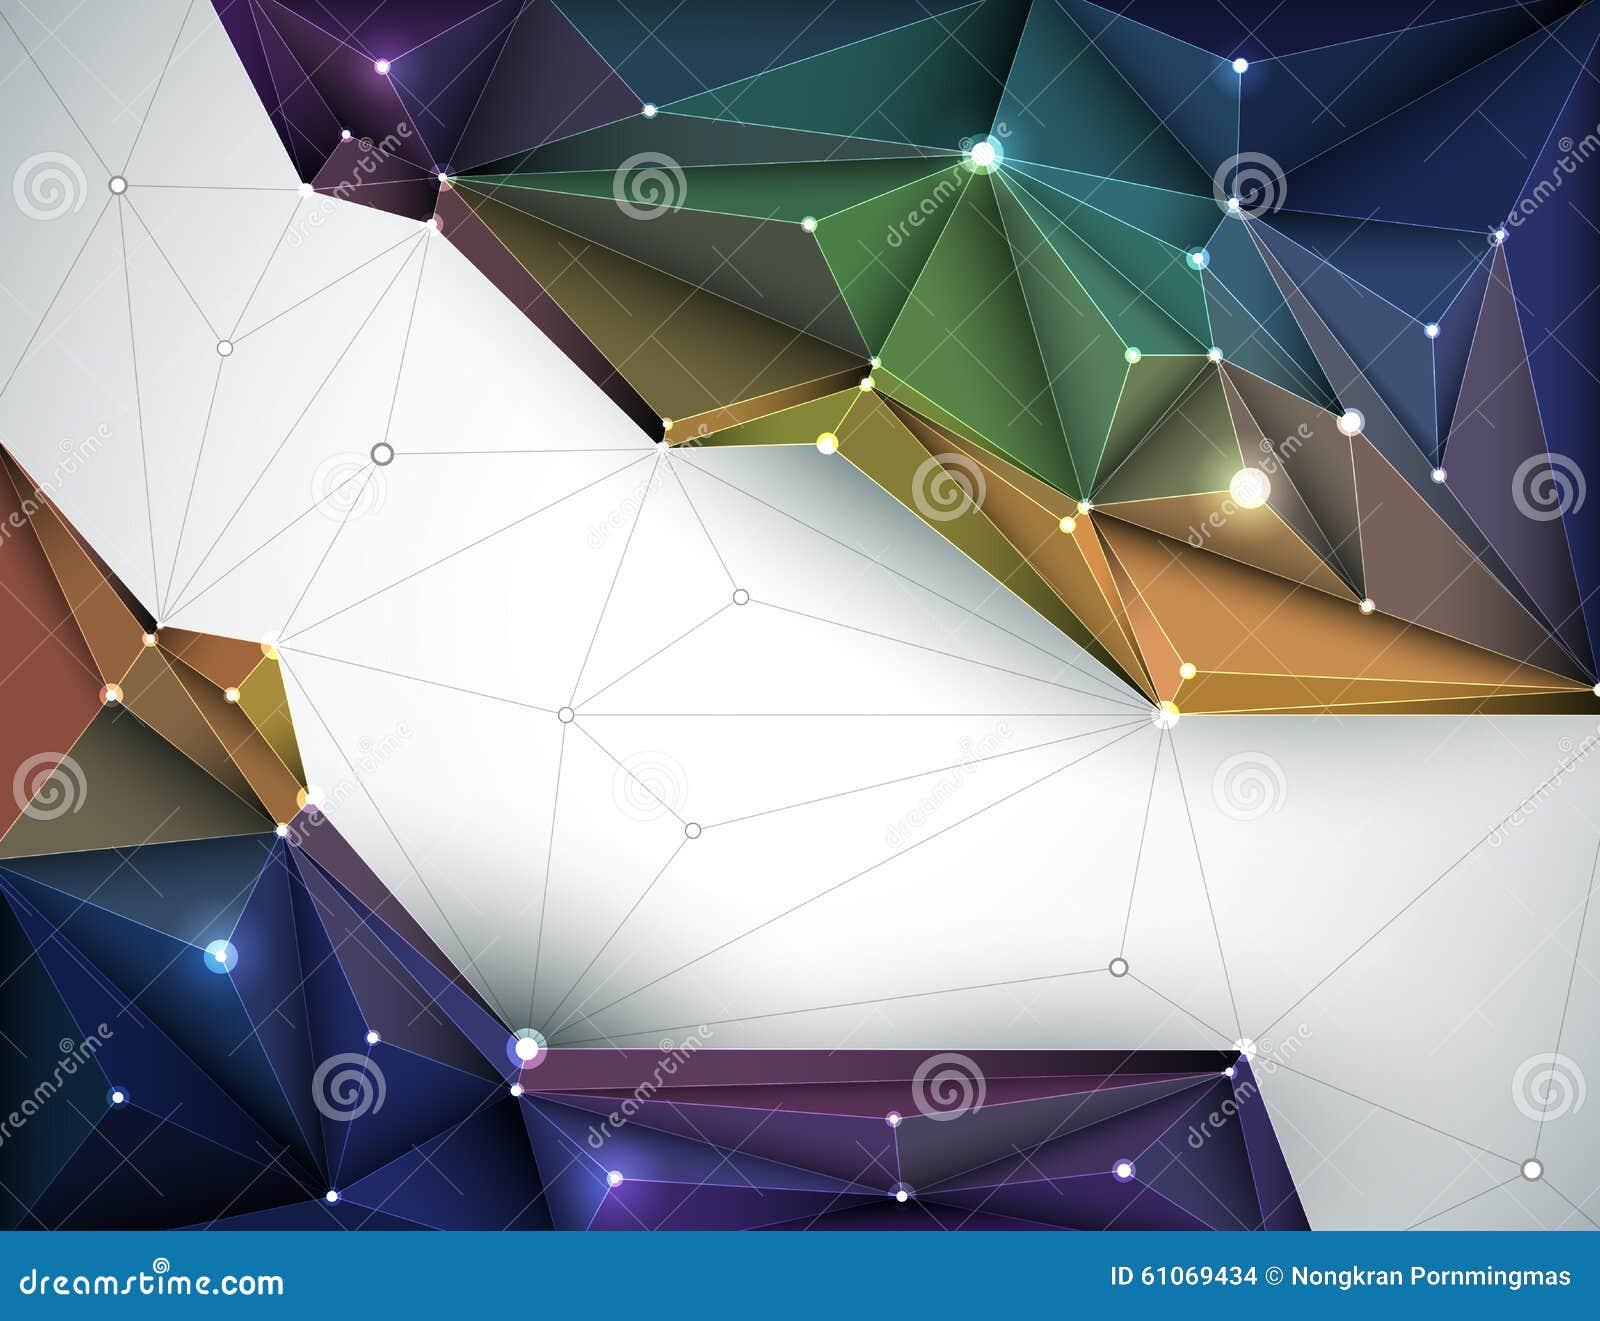 Vector die Illustration abstraktes 3D geometrisch, polygonal, Dreieckmuster in der Molekülstrukturform